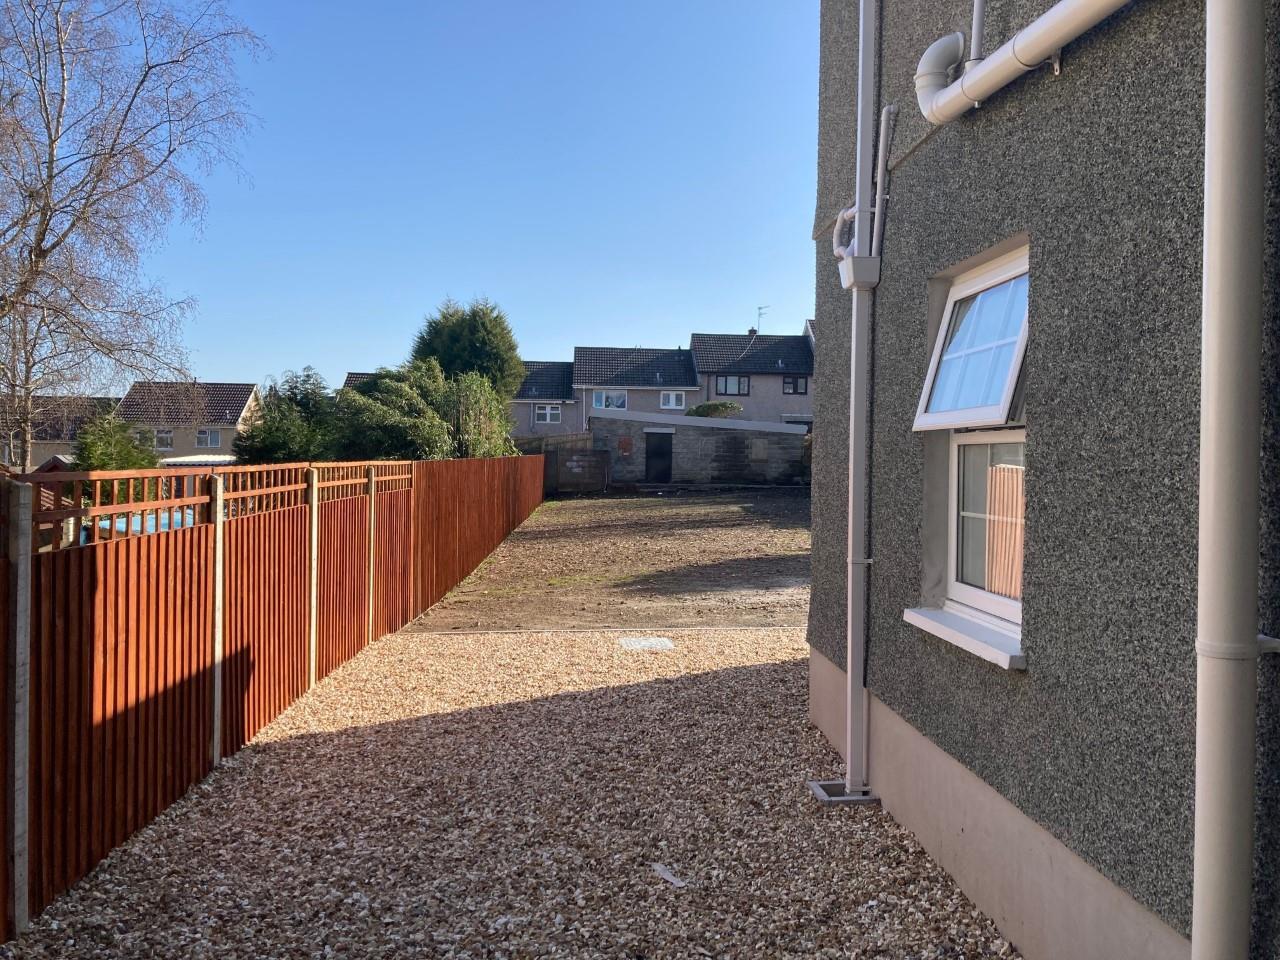 Caemawr Road, Morriston, Swansea, SA6 7DX